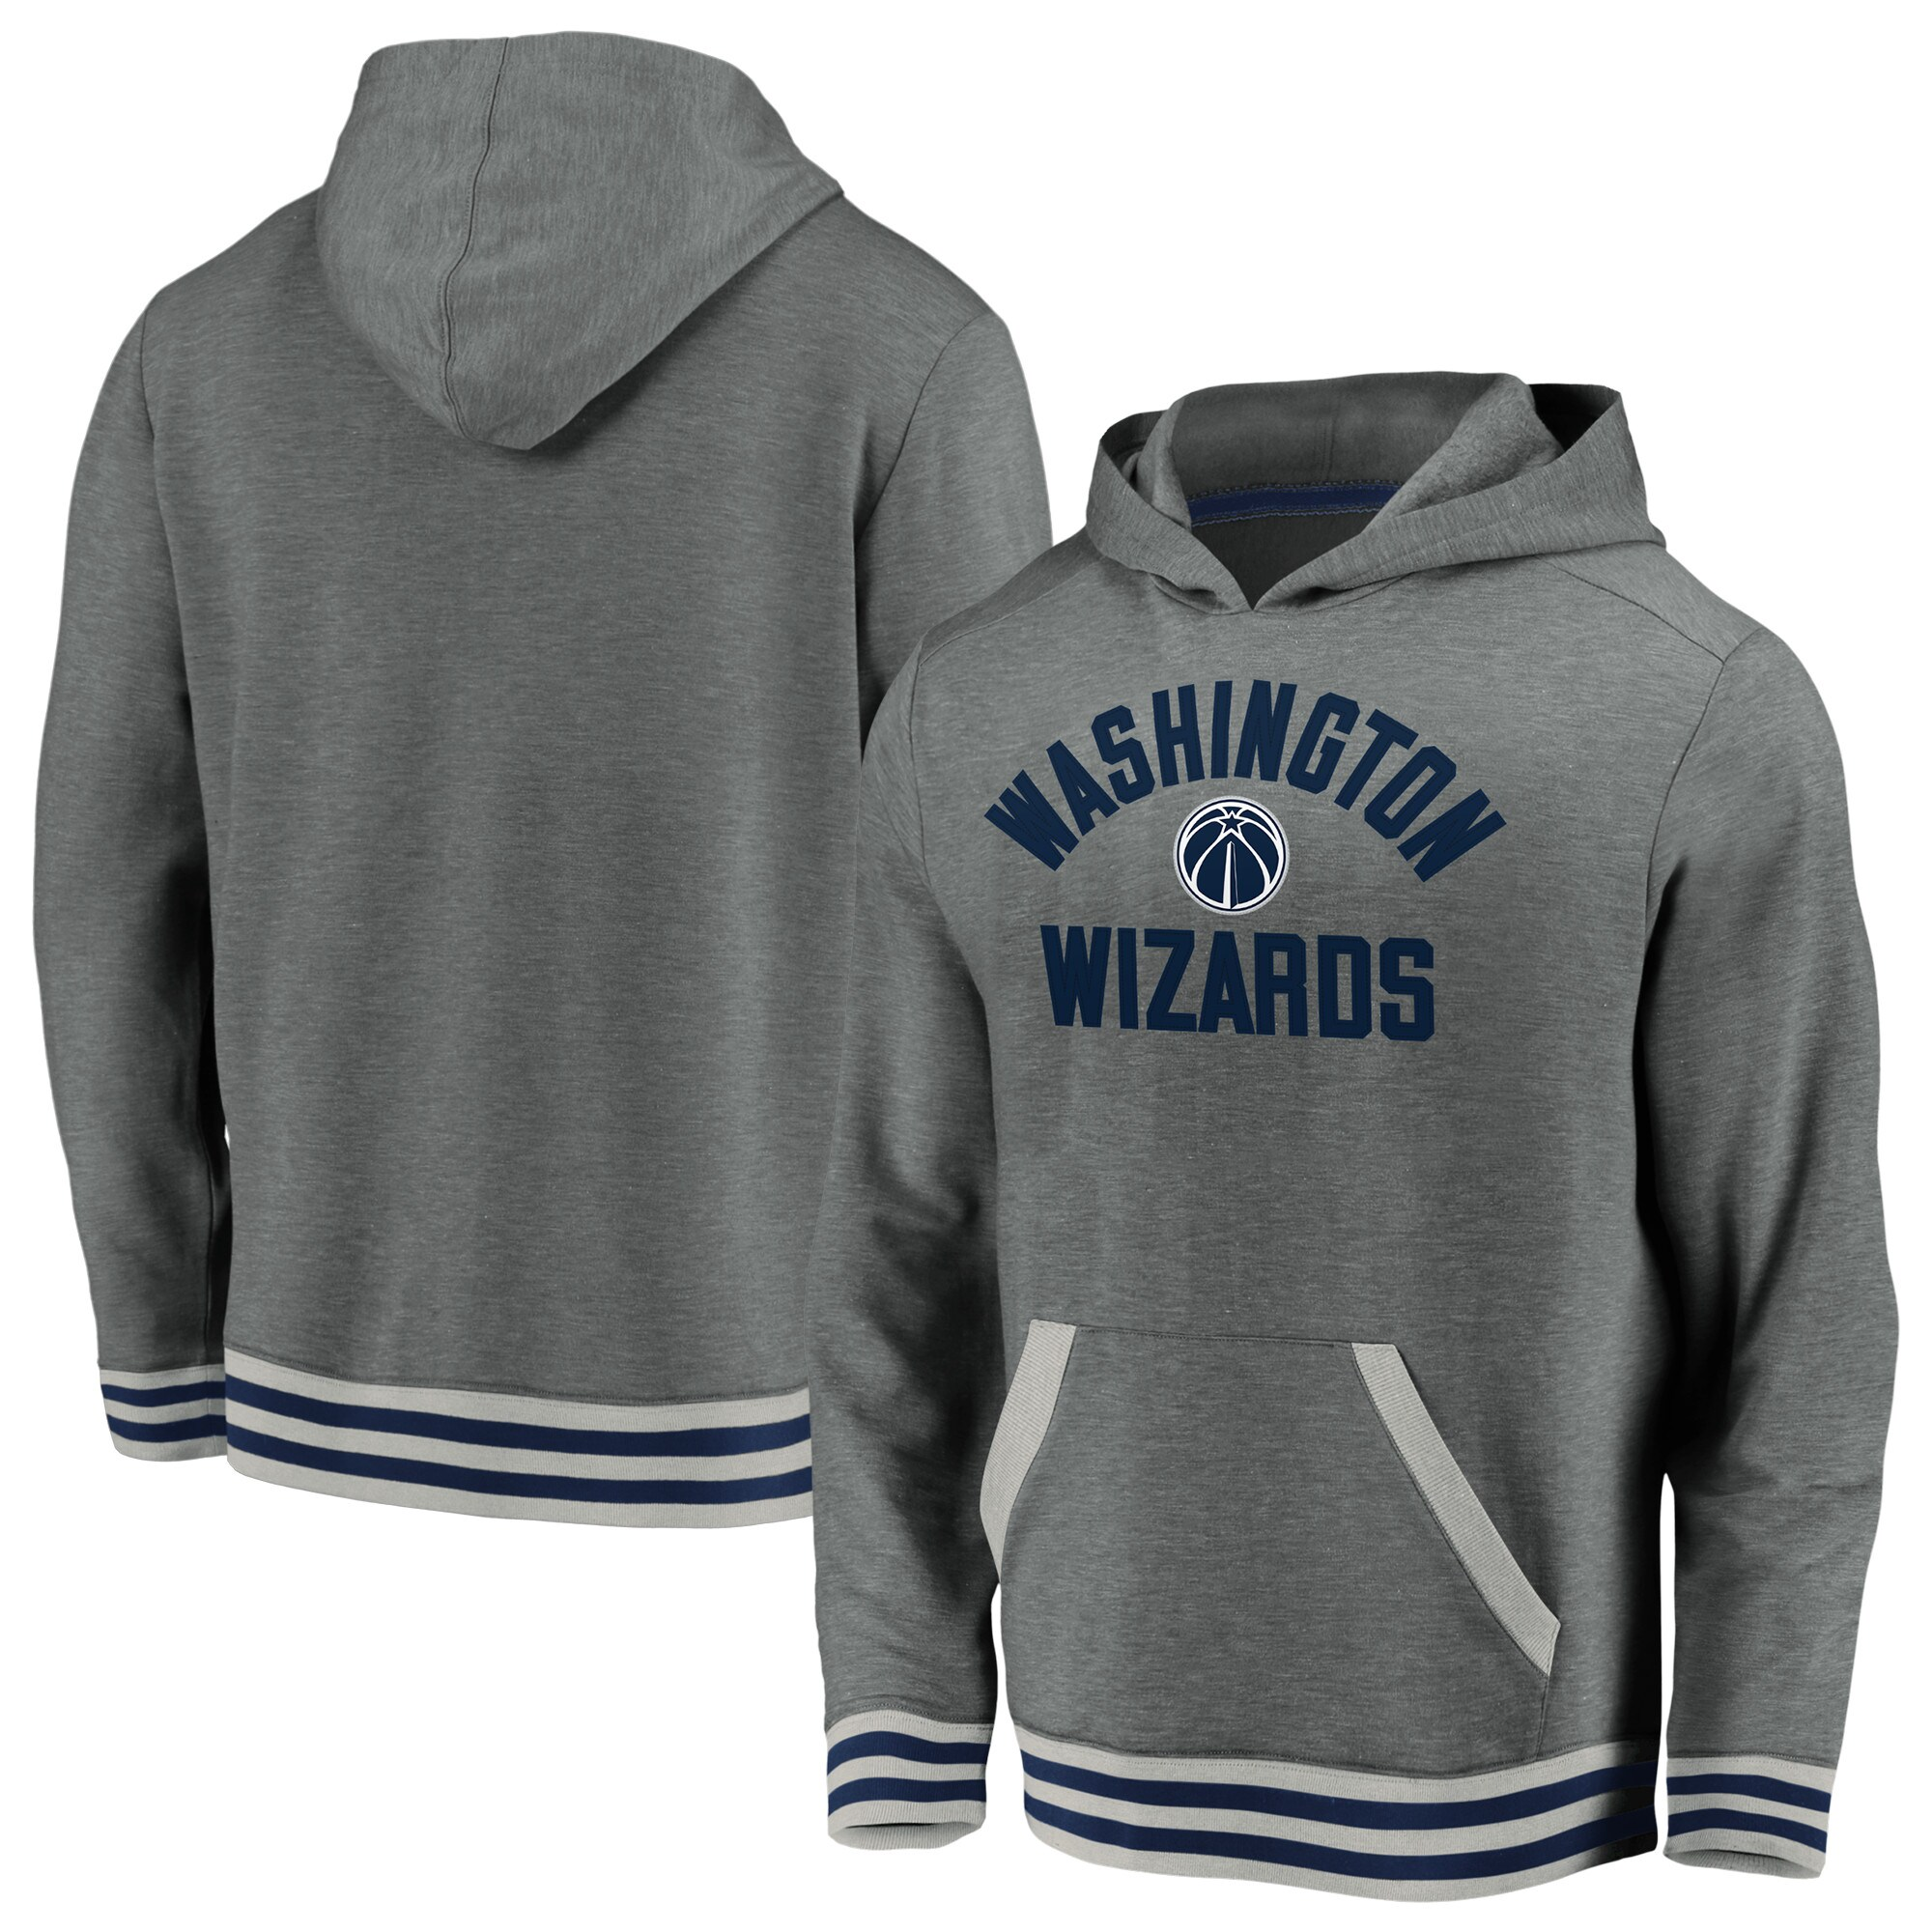 Washington Wizards Fanatics Branded True Classics Vintage Upperclassman Tri-Blend Pullover Hoodie - Gray